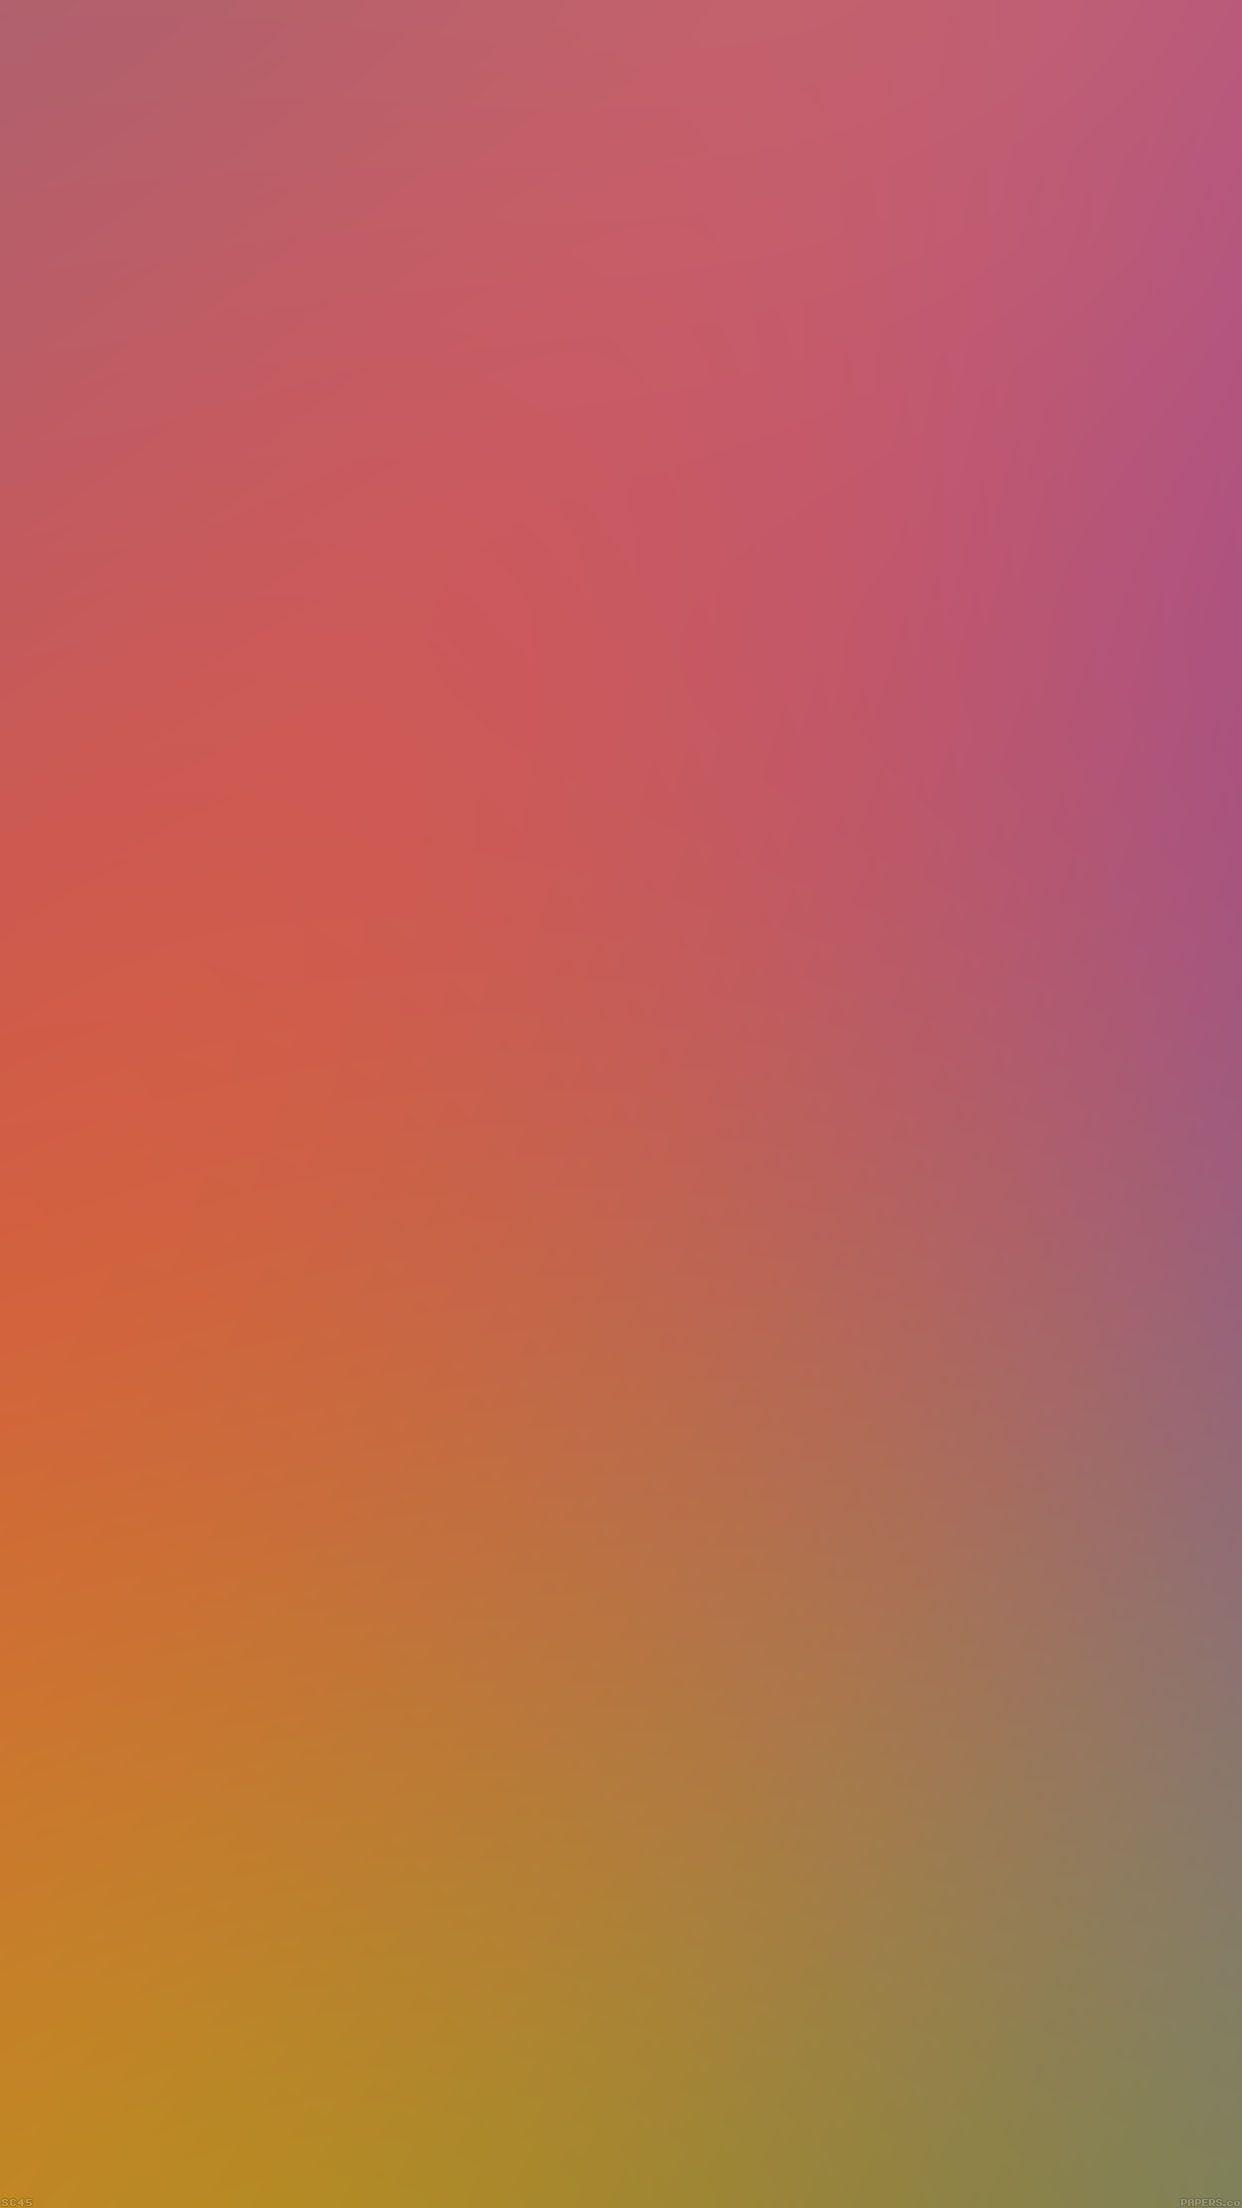 iphone 6 plus wallpaper retina collections